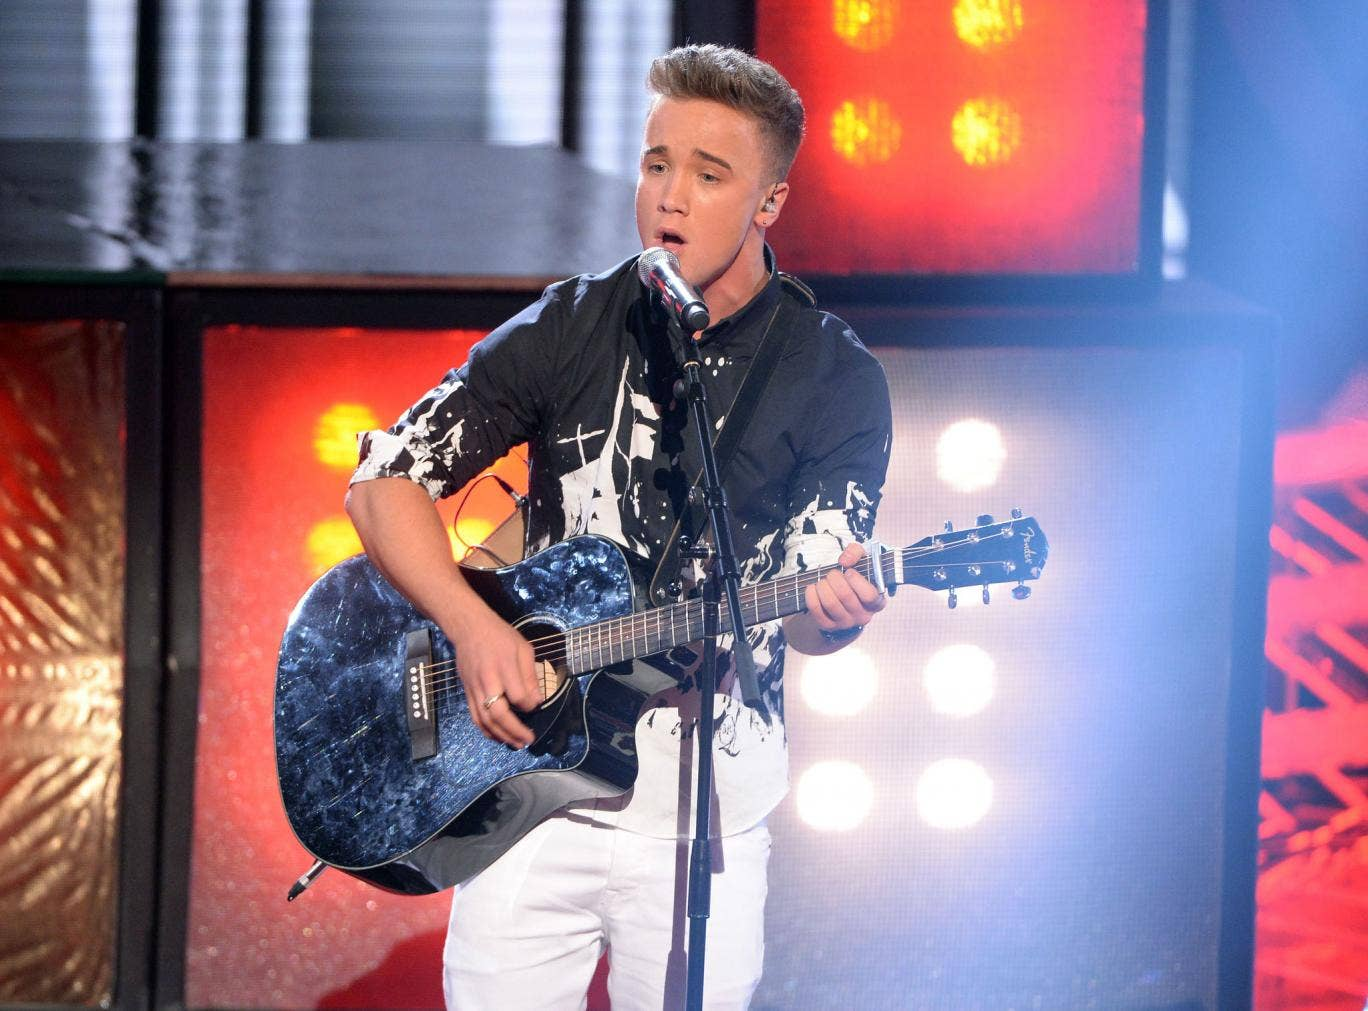 X Factor 2013 contestant Sam Callahan